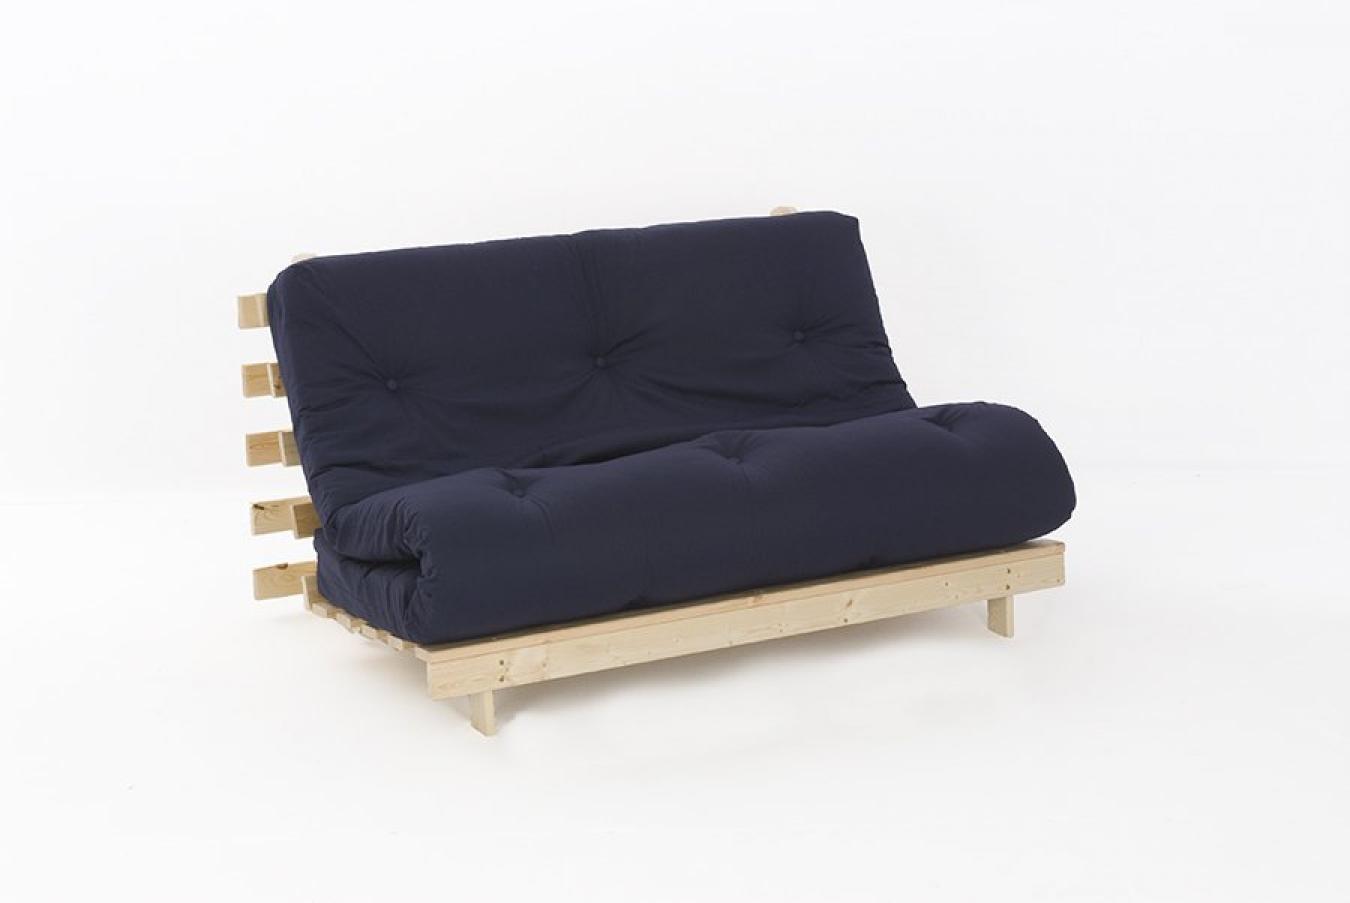 Photos canap233 futon ikea : fullcanape futon ikea10 from mediene-habitat.fr size 1350 x 903 jpeg 40kB